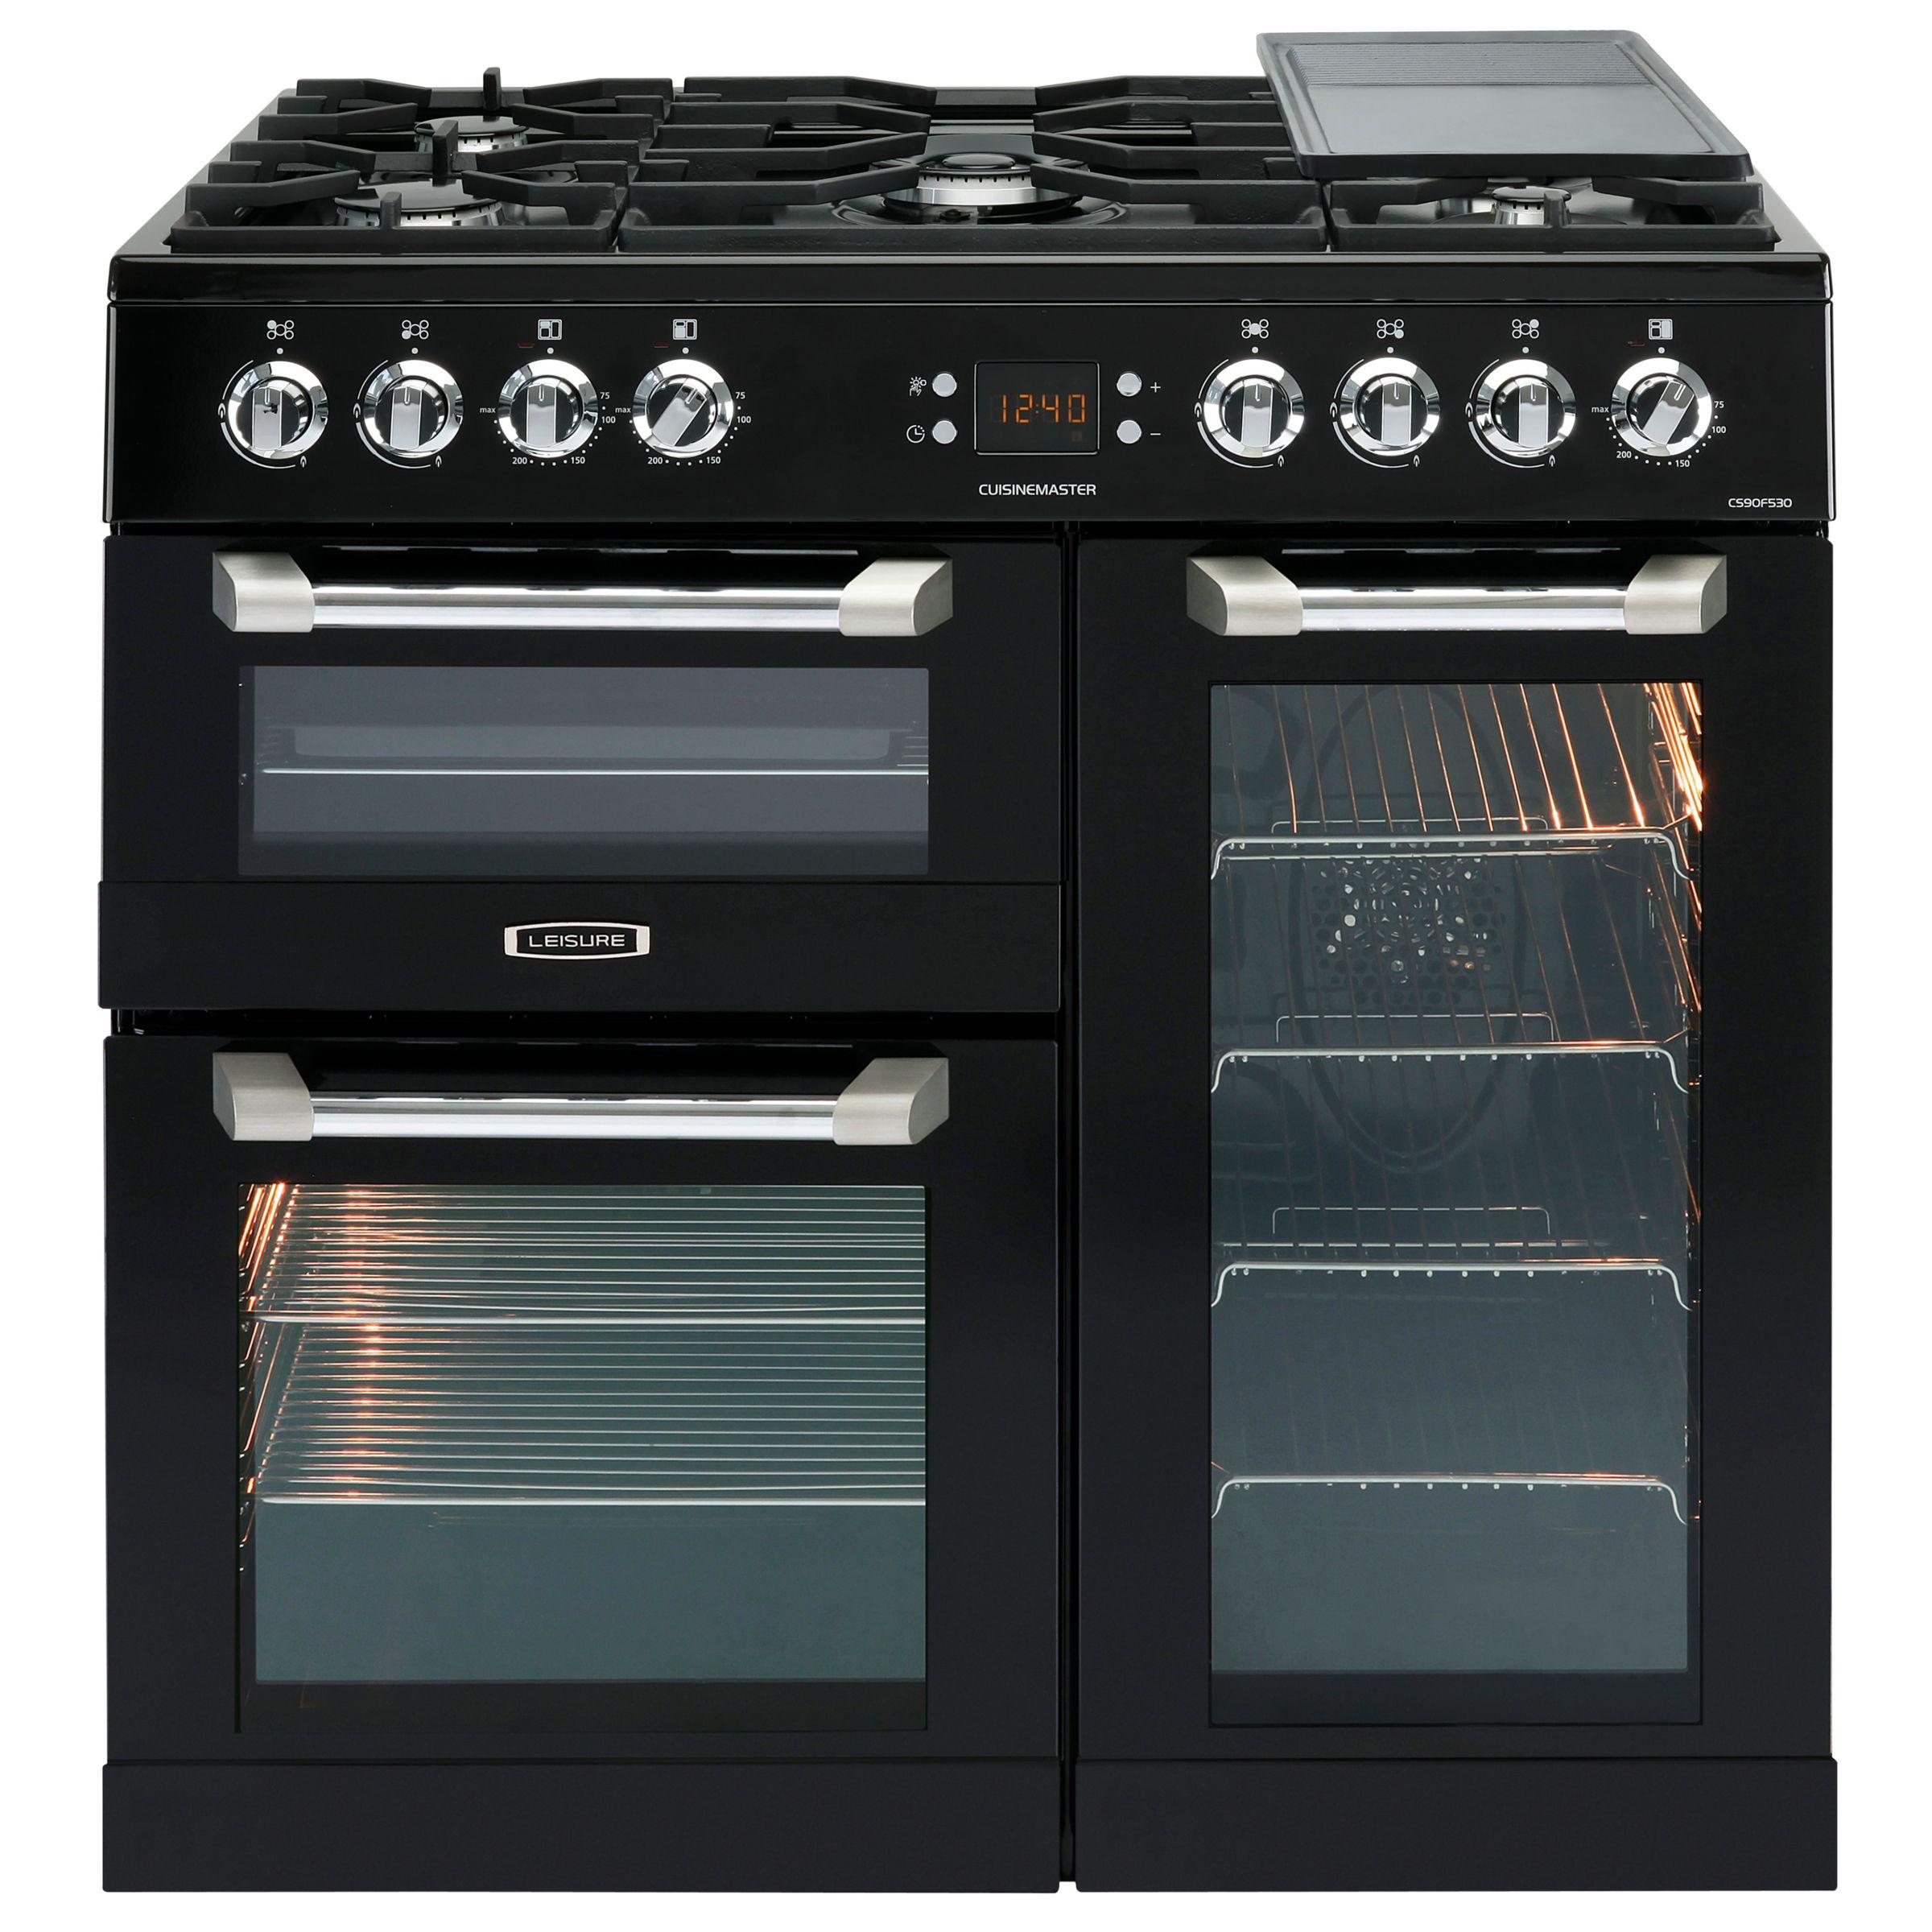 Leisure Leisure CS90F530 Cuisinemaster Dual Fuel Range Cooker